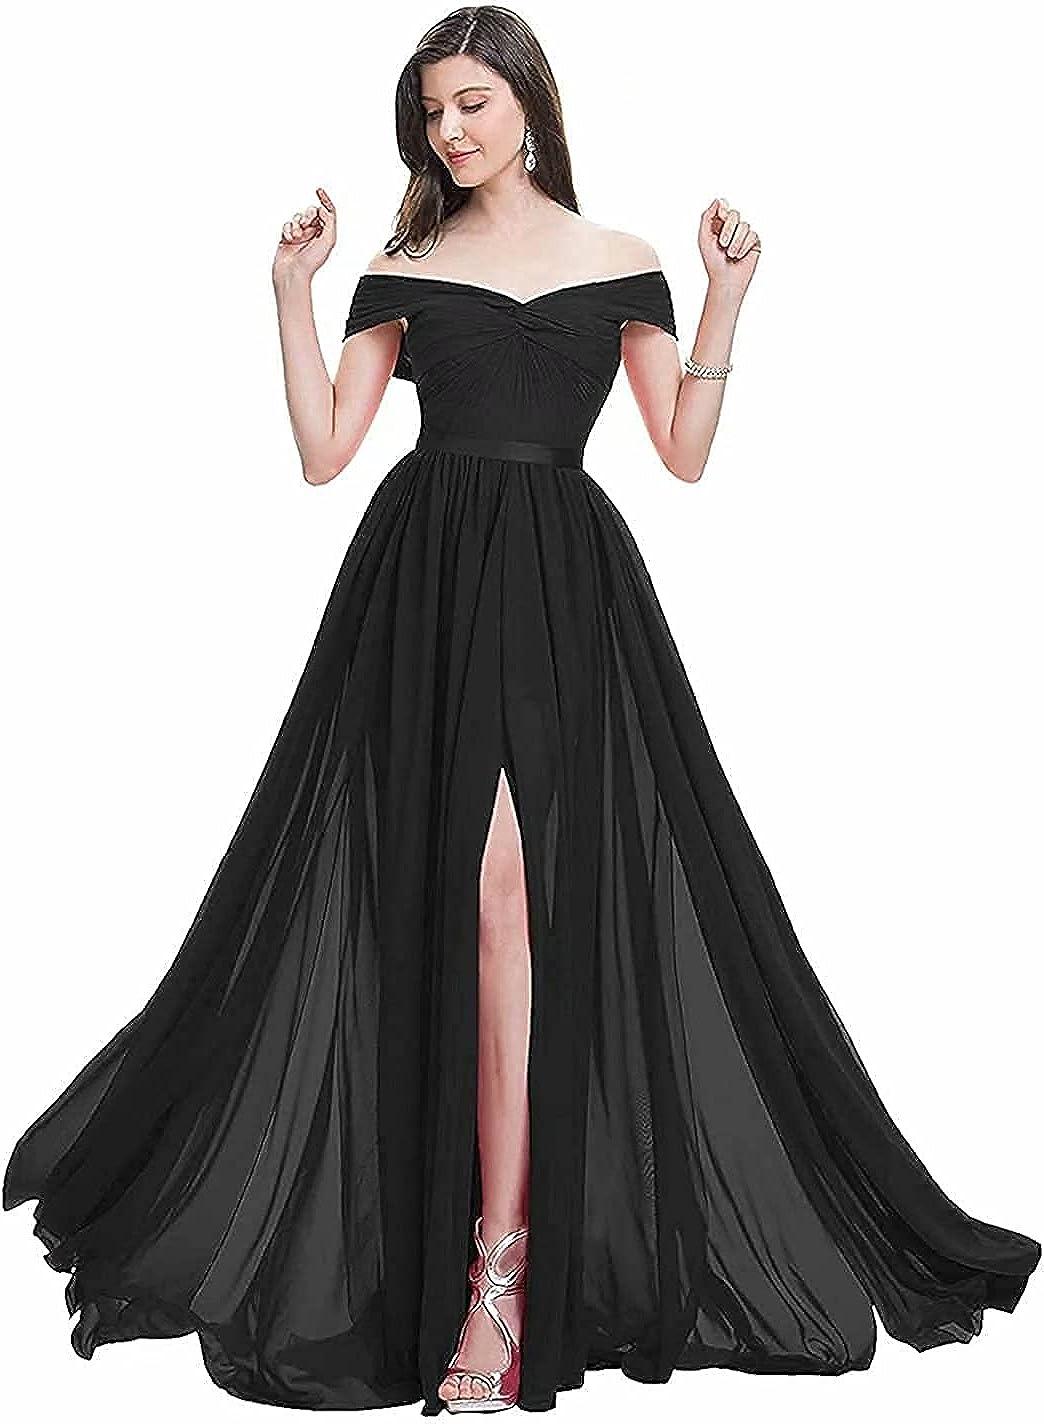 BTgirl Women's Off Shoulder Bridesmaid Dresses with Slit A Line Chiffon Long Formal Evening Dresses